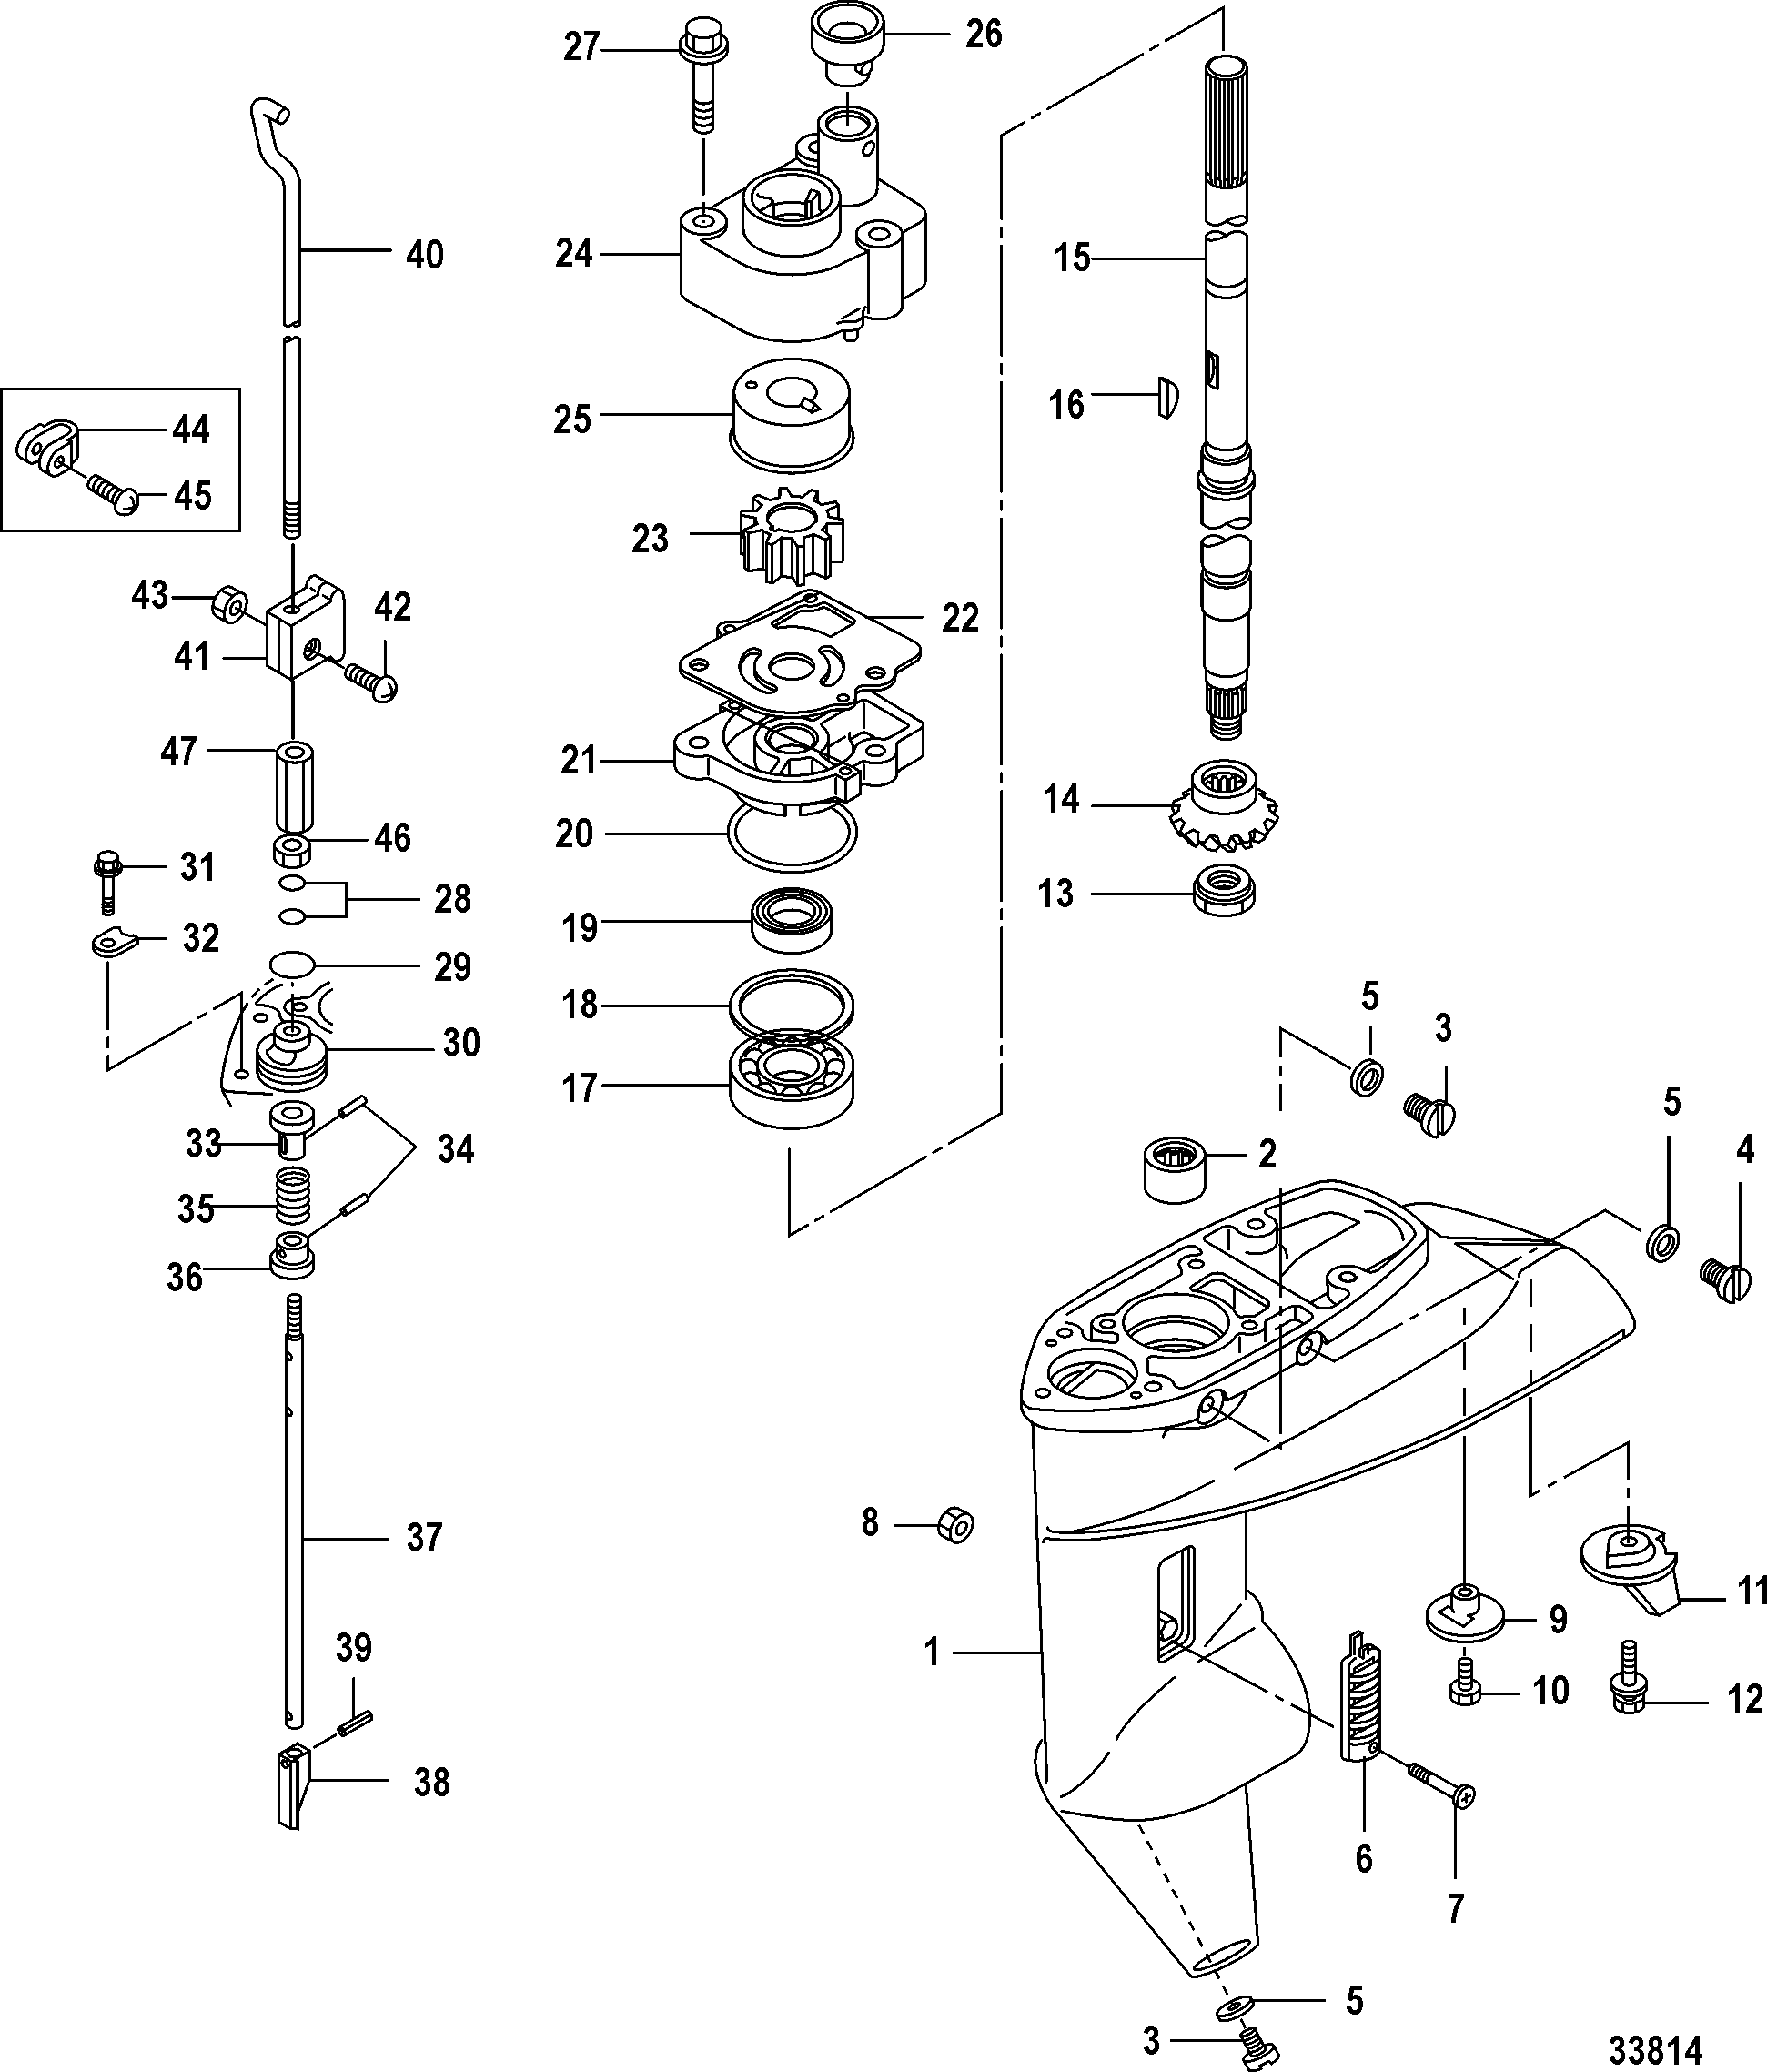 Каталог запчастей mariner 20 carb(2cyl)(4 stroke) 0r235168 \u0026 up